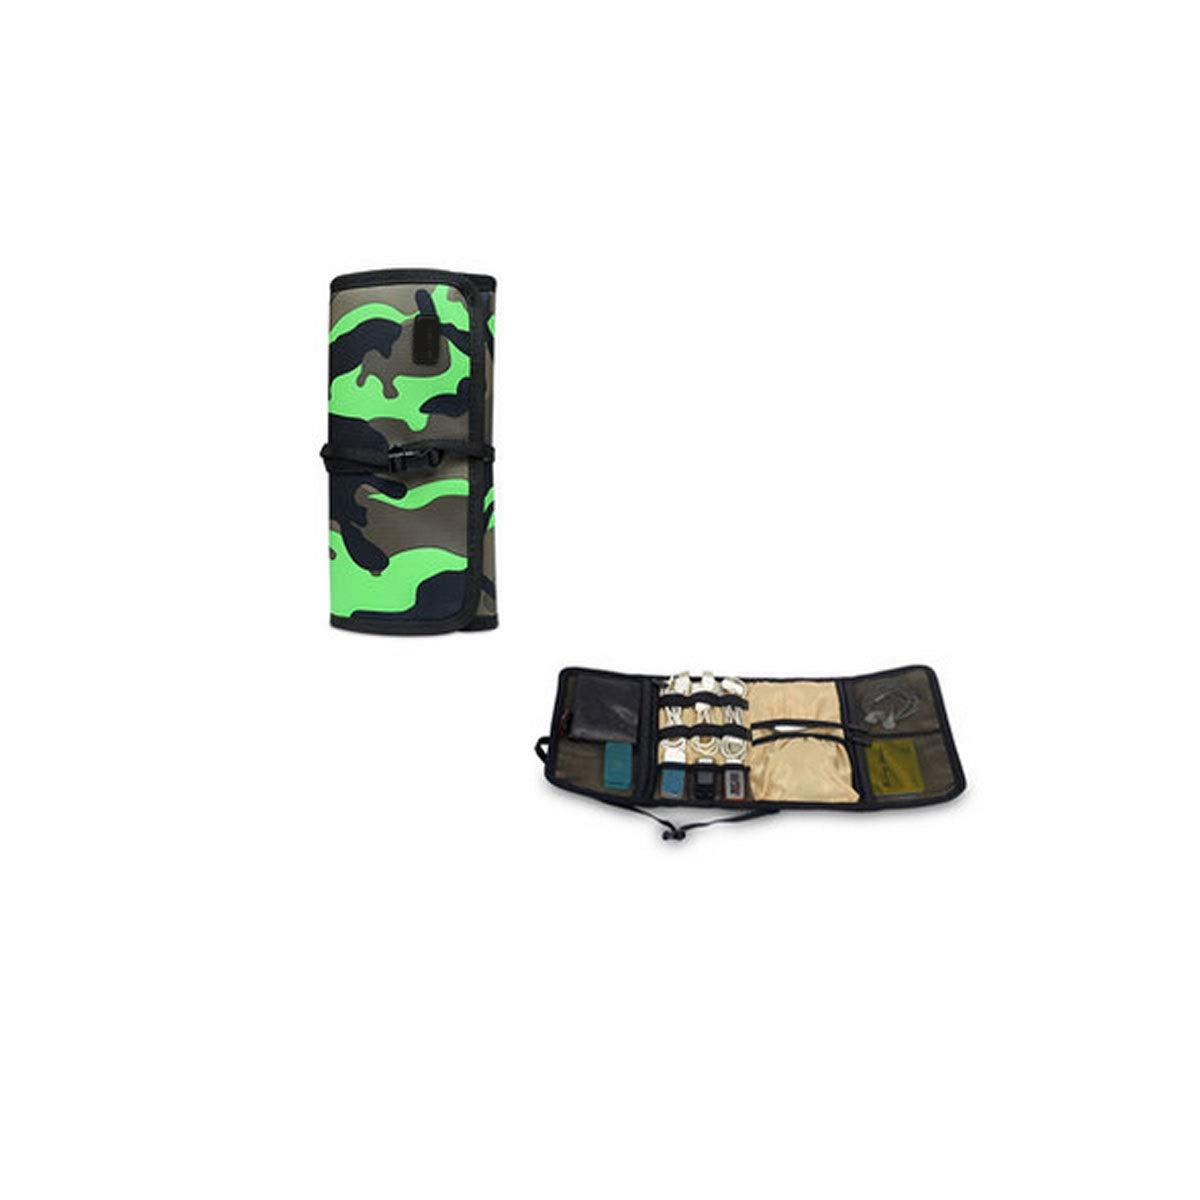 Huijunwenti Electronic Organizer,Cable Organizer,Data Cord Storage Bag, Mobile Power Charging Treasure Business Card Storage Bag, Mobile Hard Disk Package, Digital Travel Portable Folding Storage